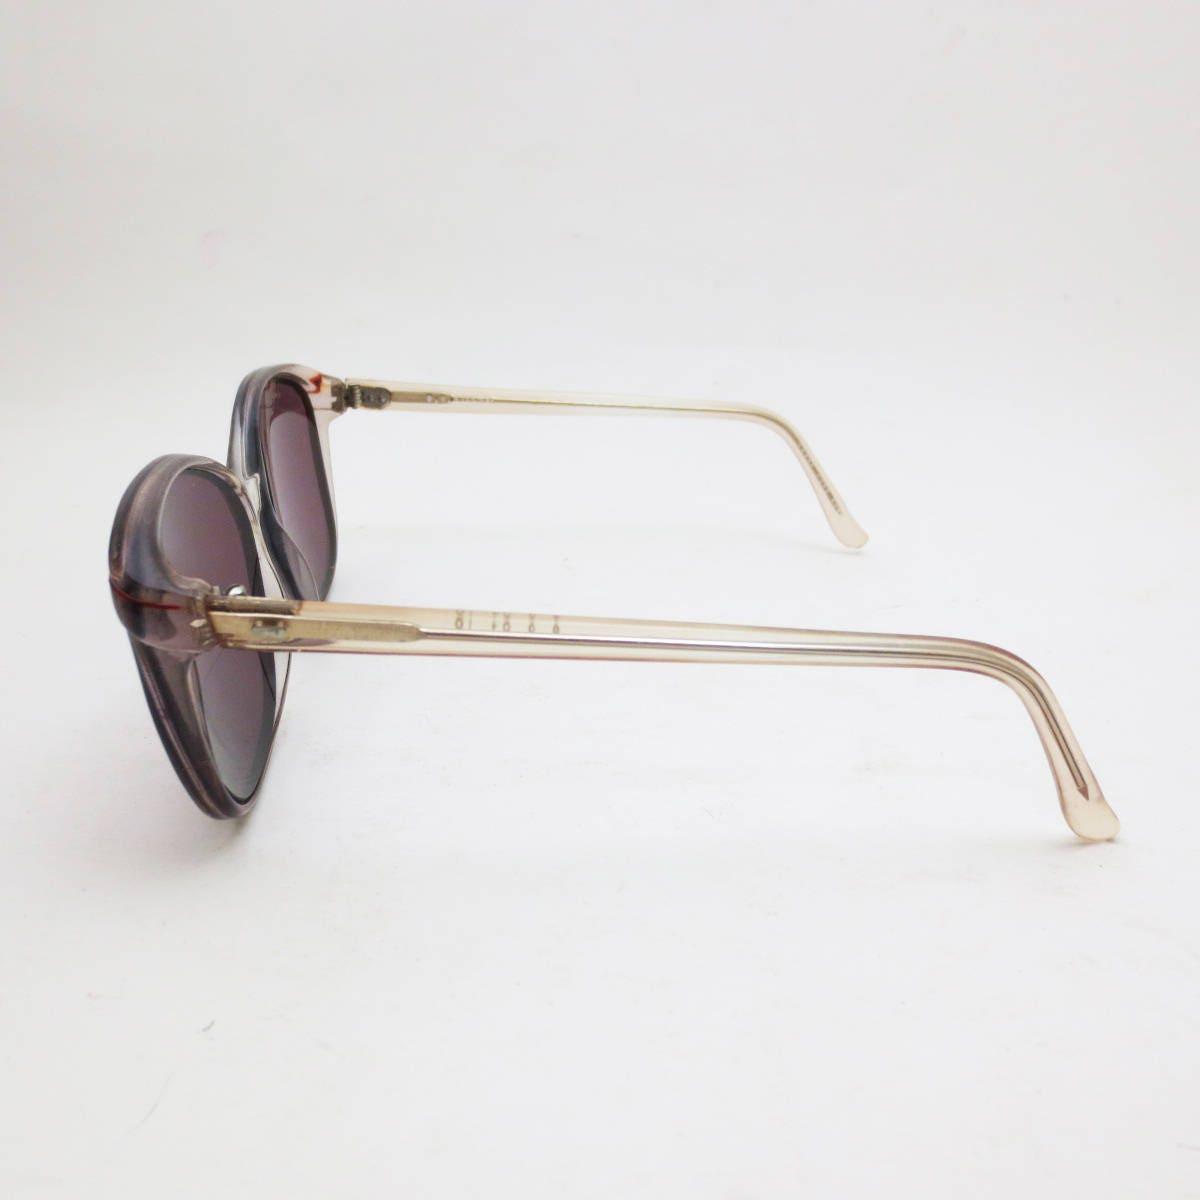 Vintage 80\'s Sunglasses Prescription Eyeglasses Clear Acrylic ...